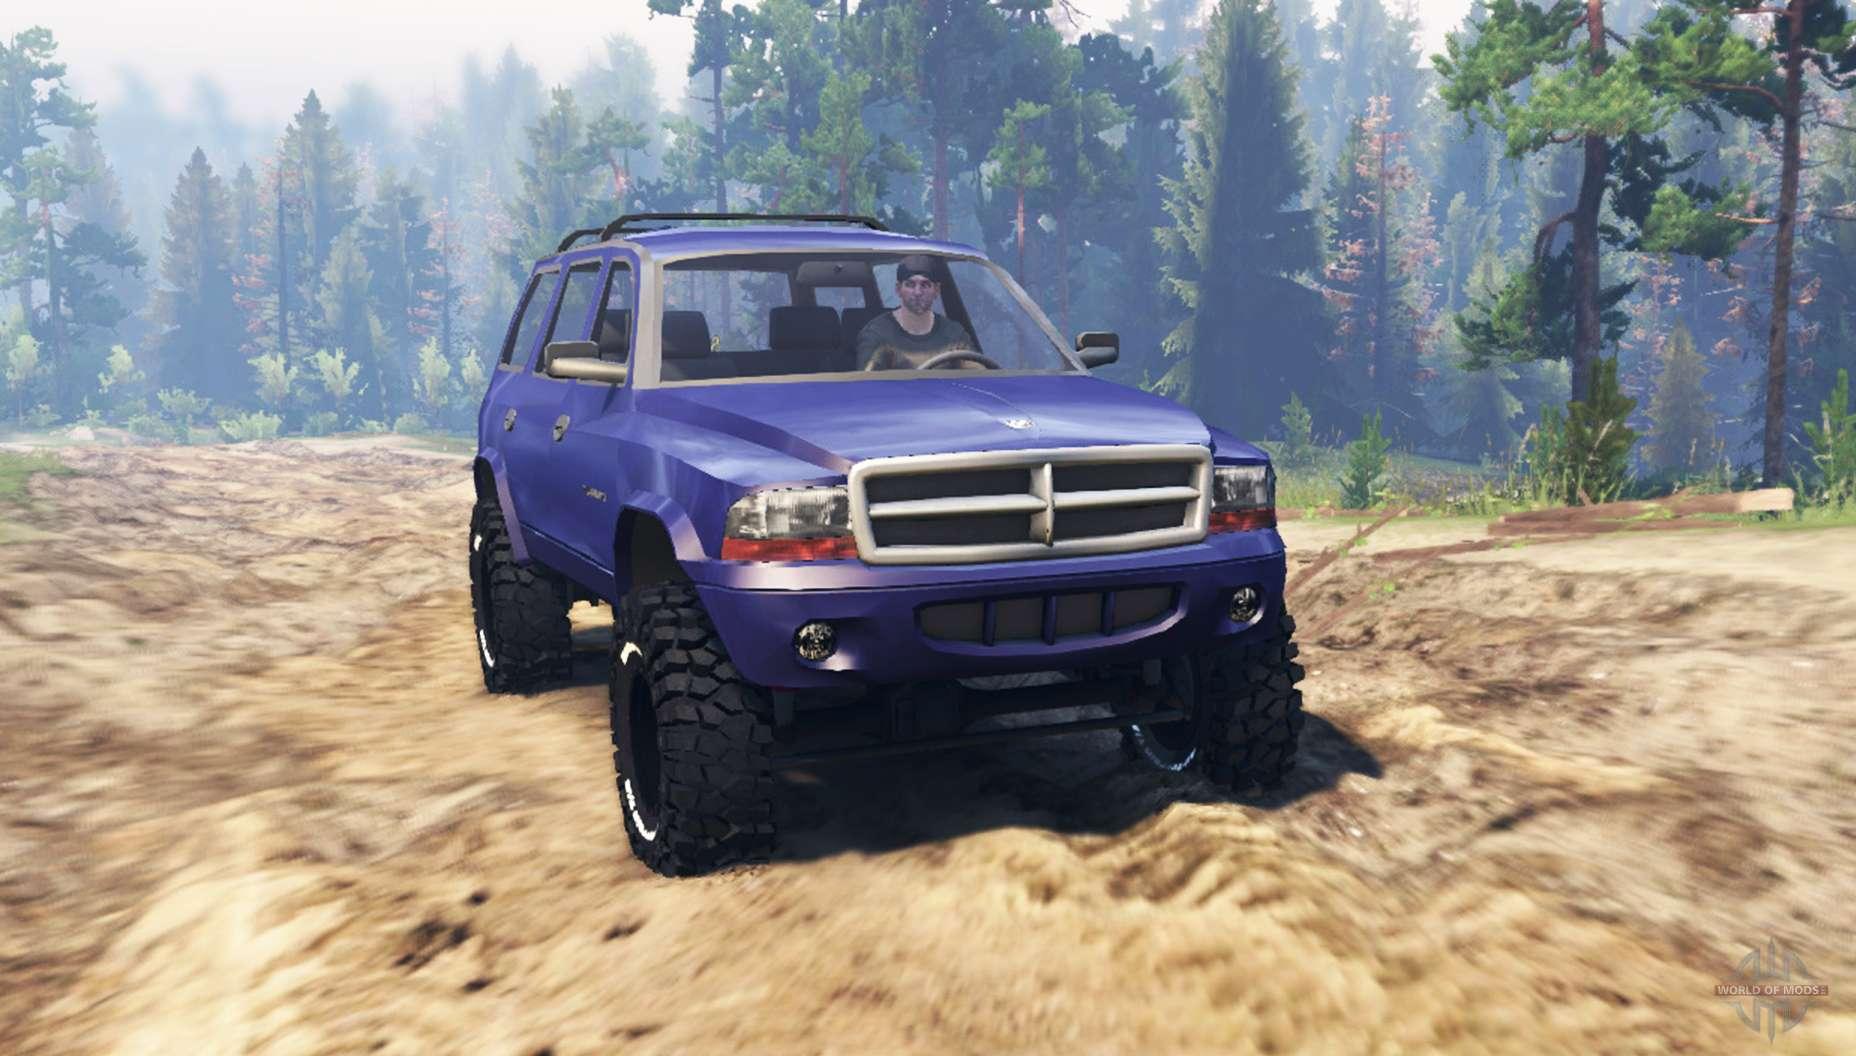 Spintires on 03 Dodge Durango